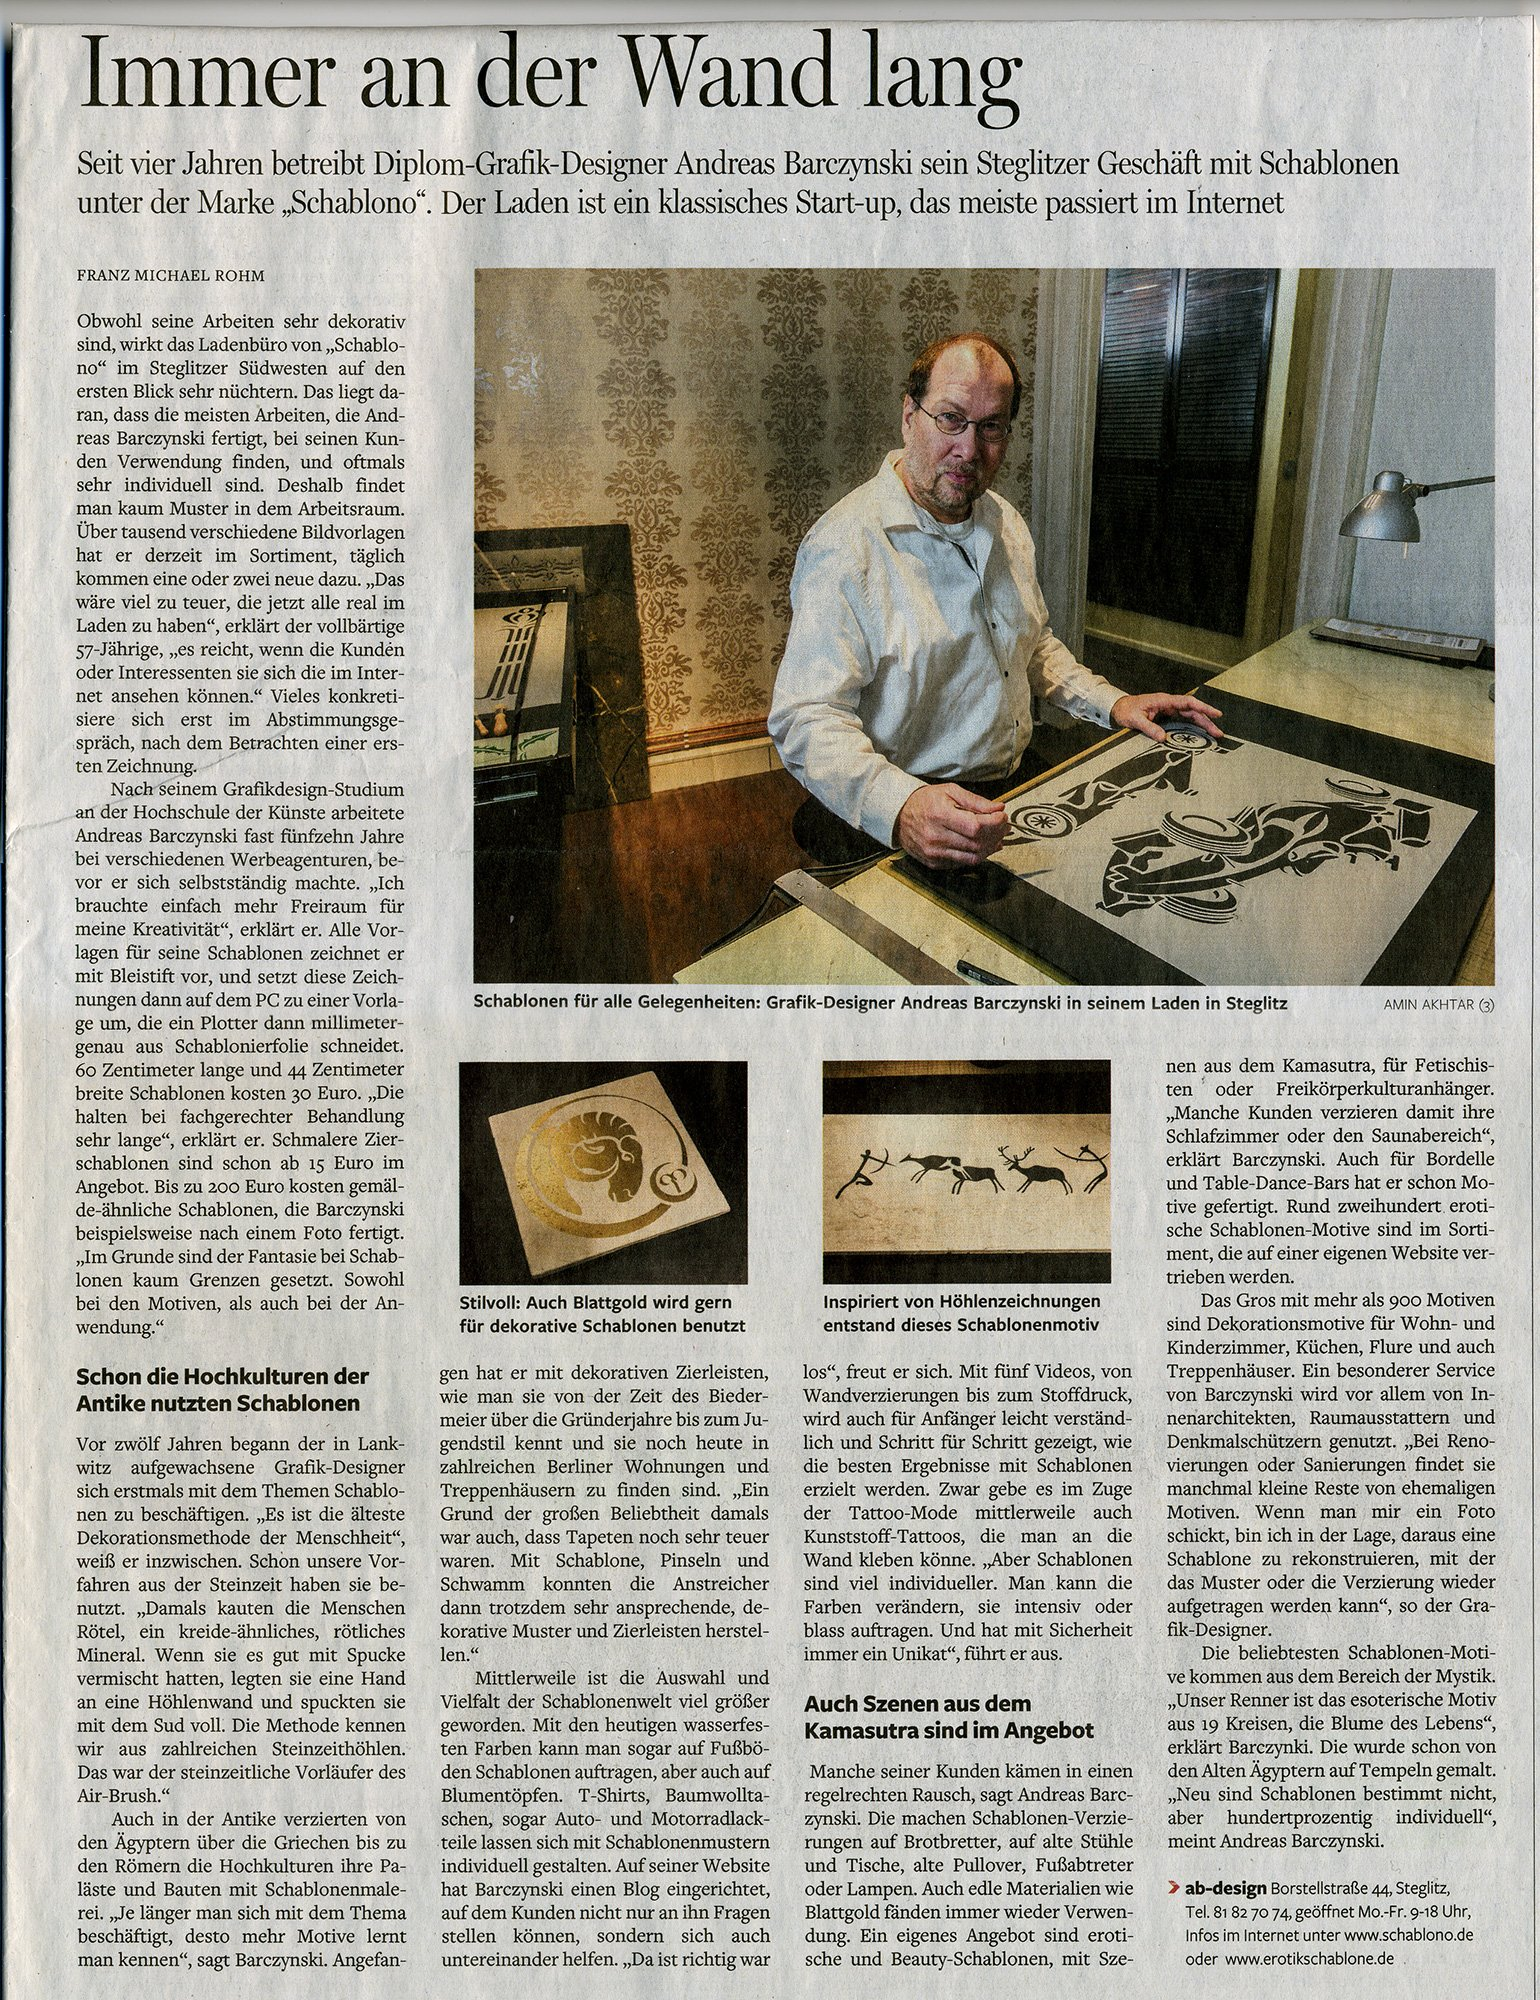 Presse: Schablono in der Berliner Morgenpost